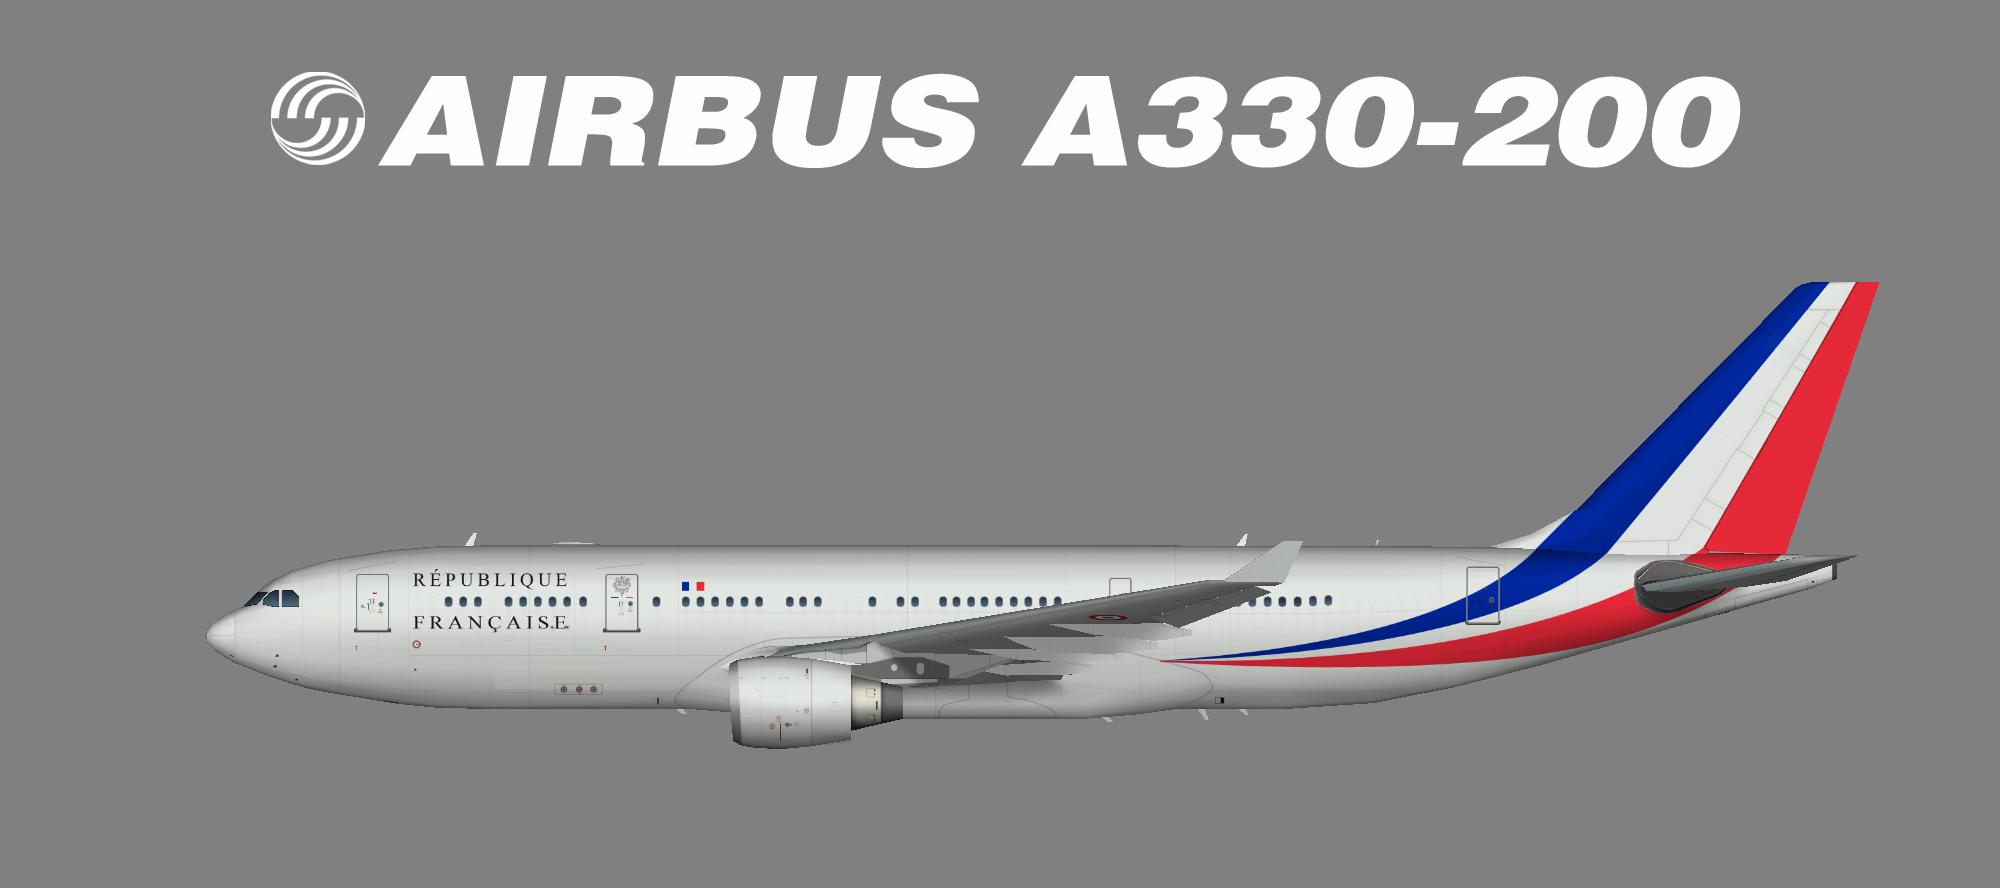 Armee de LAir A330-200